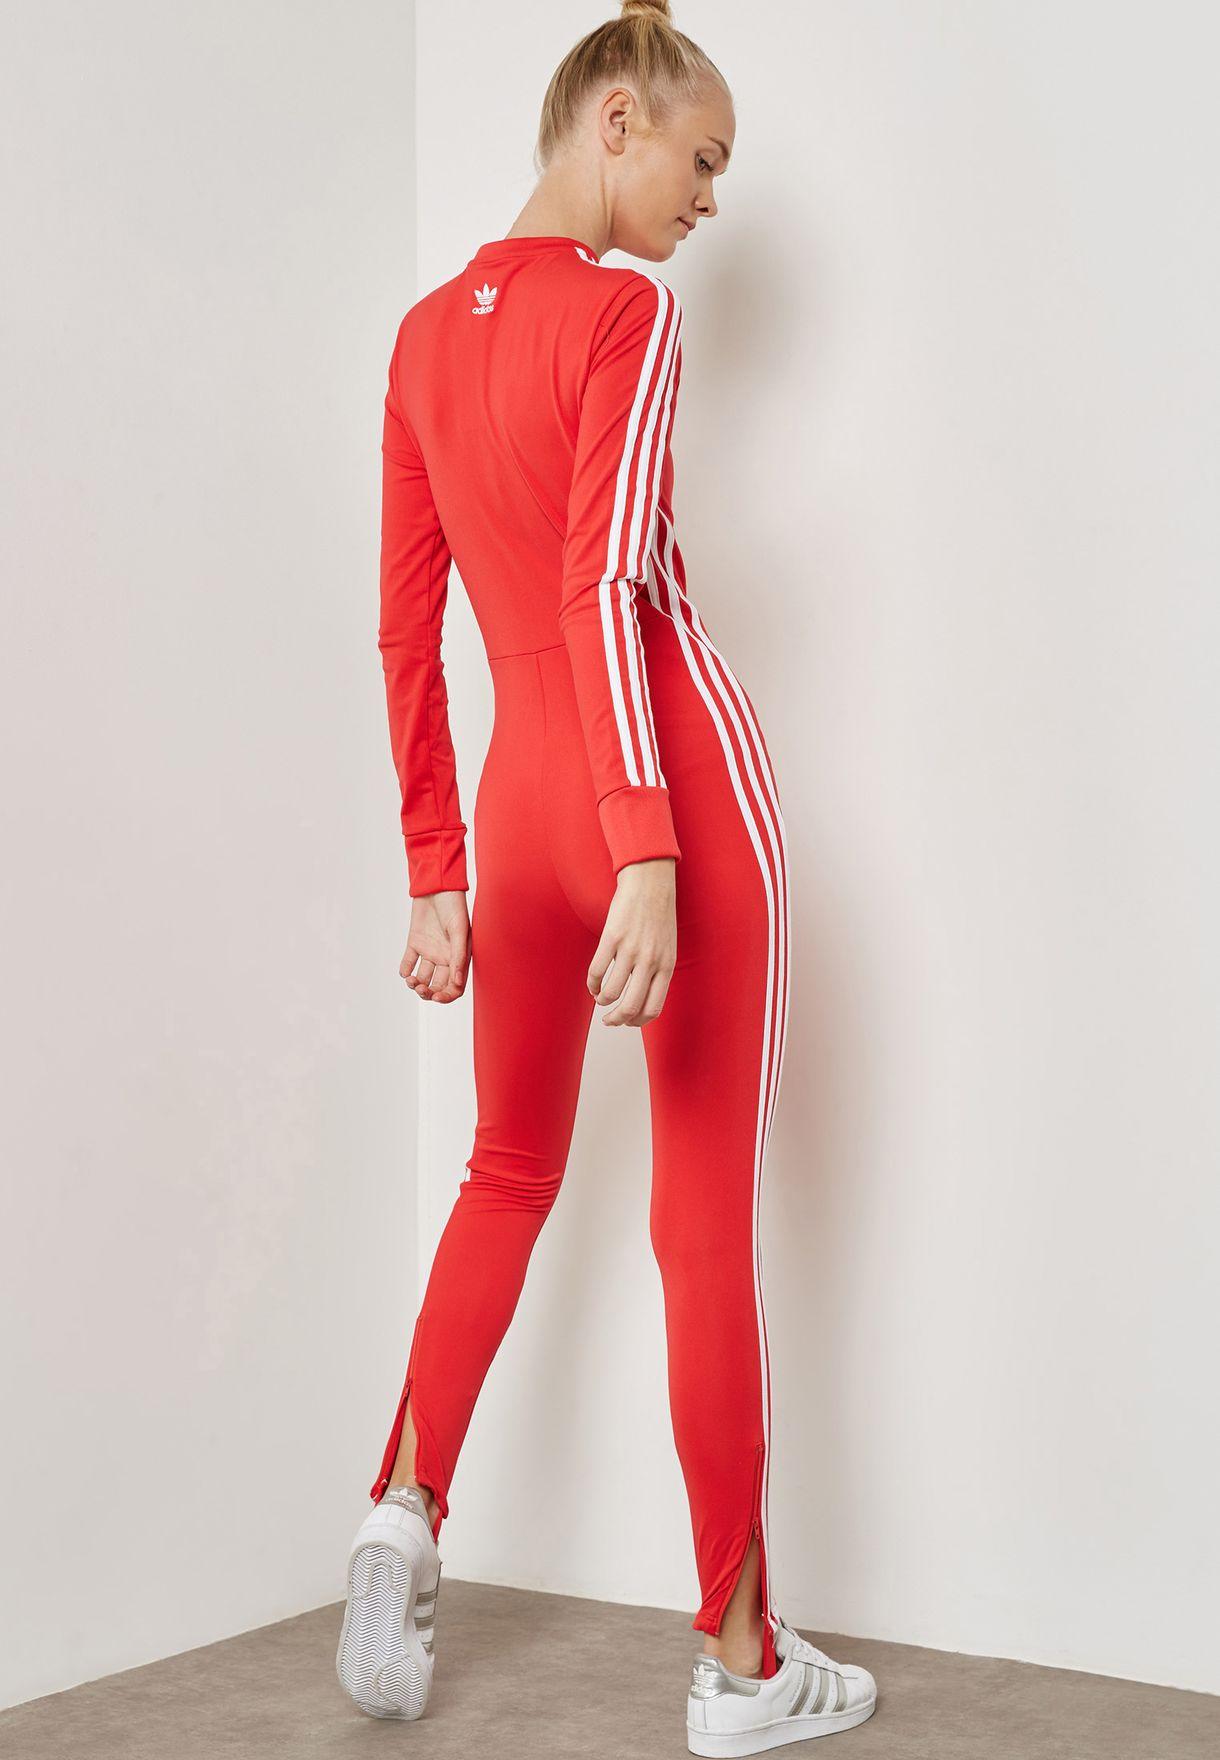 14c98aed4f03 Shop adidas Originals red adicolor Stage Jumpsuit CE4955 for Women ...